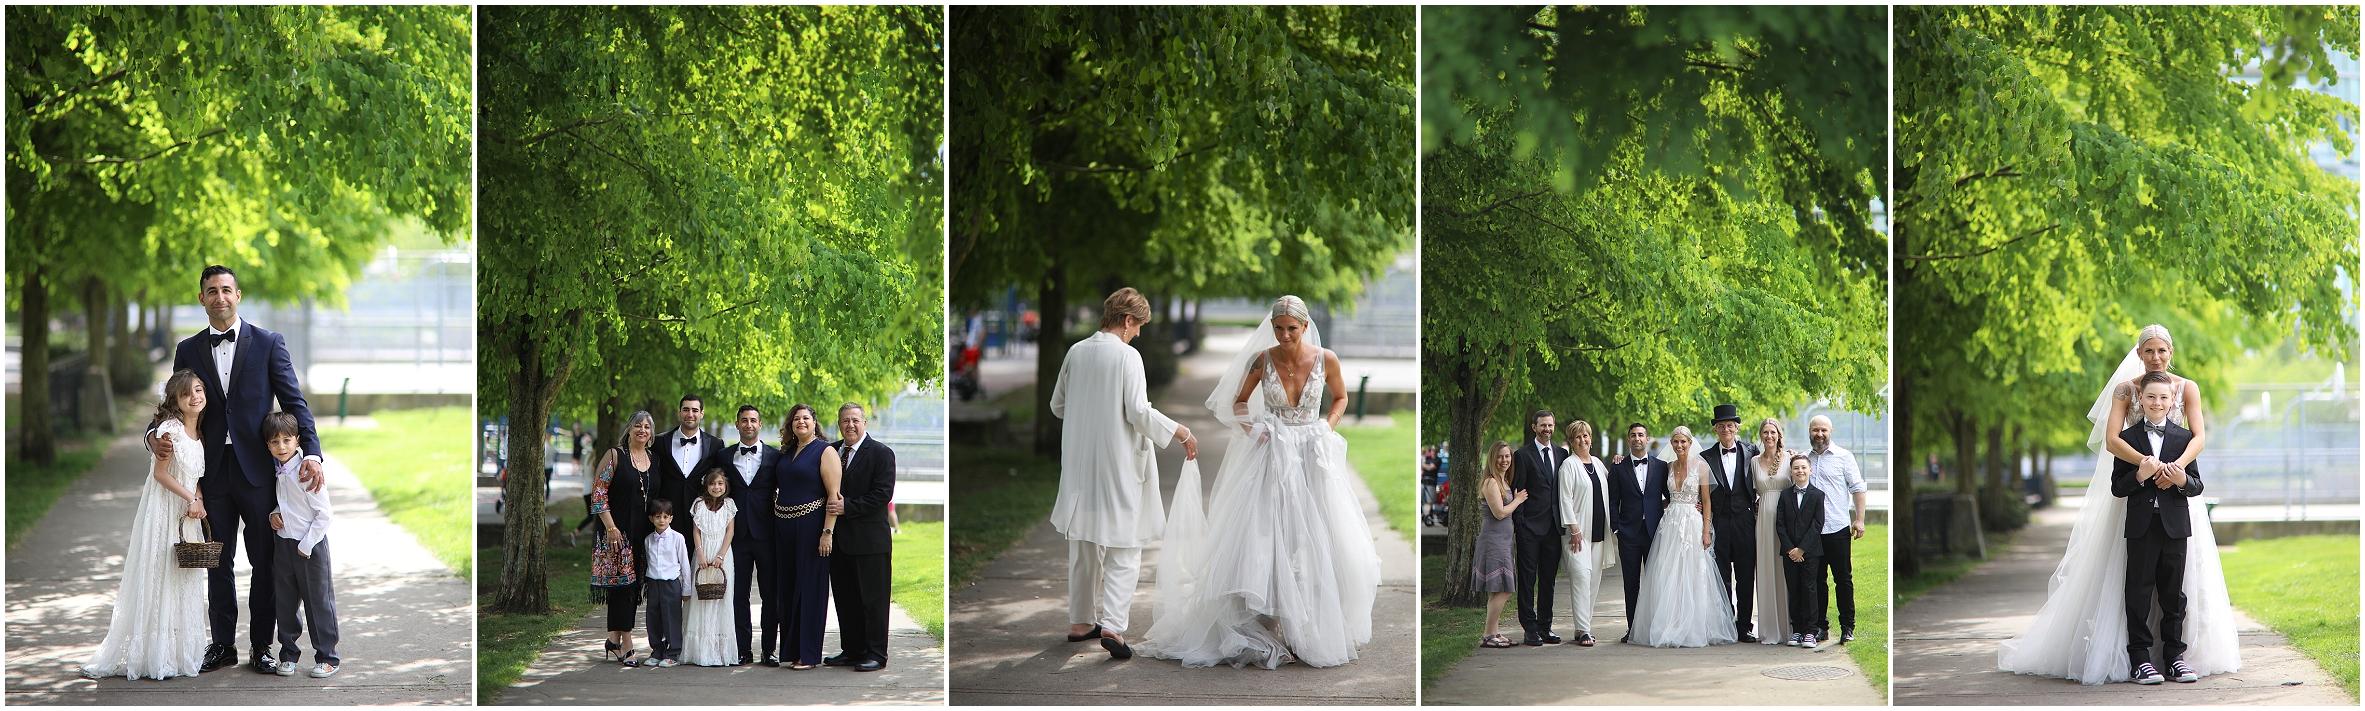 vancouver-wedding-photographer-the-loft-earls-yaletown_0019.jpg